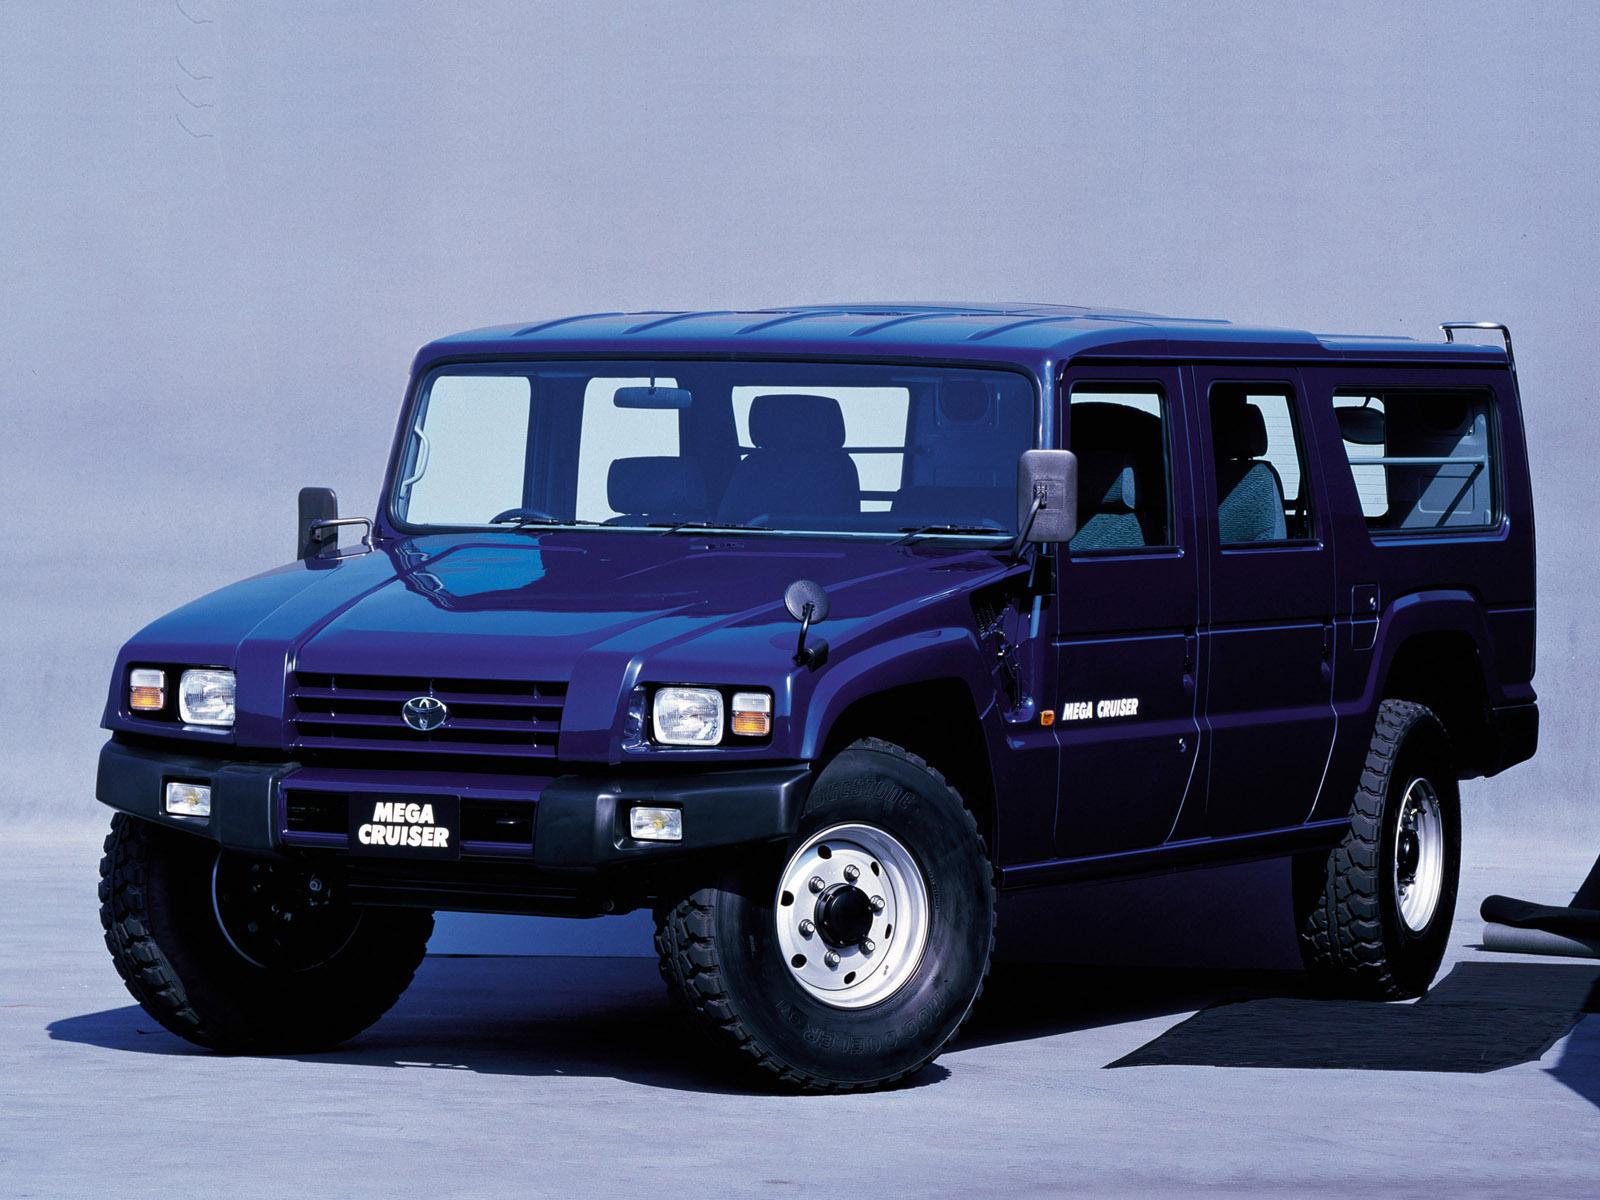 Technically Jurisprudence Diesel SUVs The Toyota Mega Cruiser